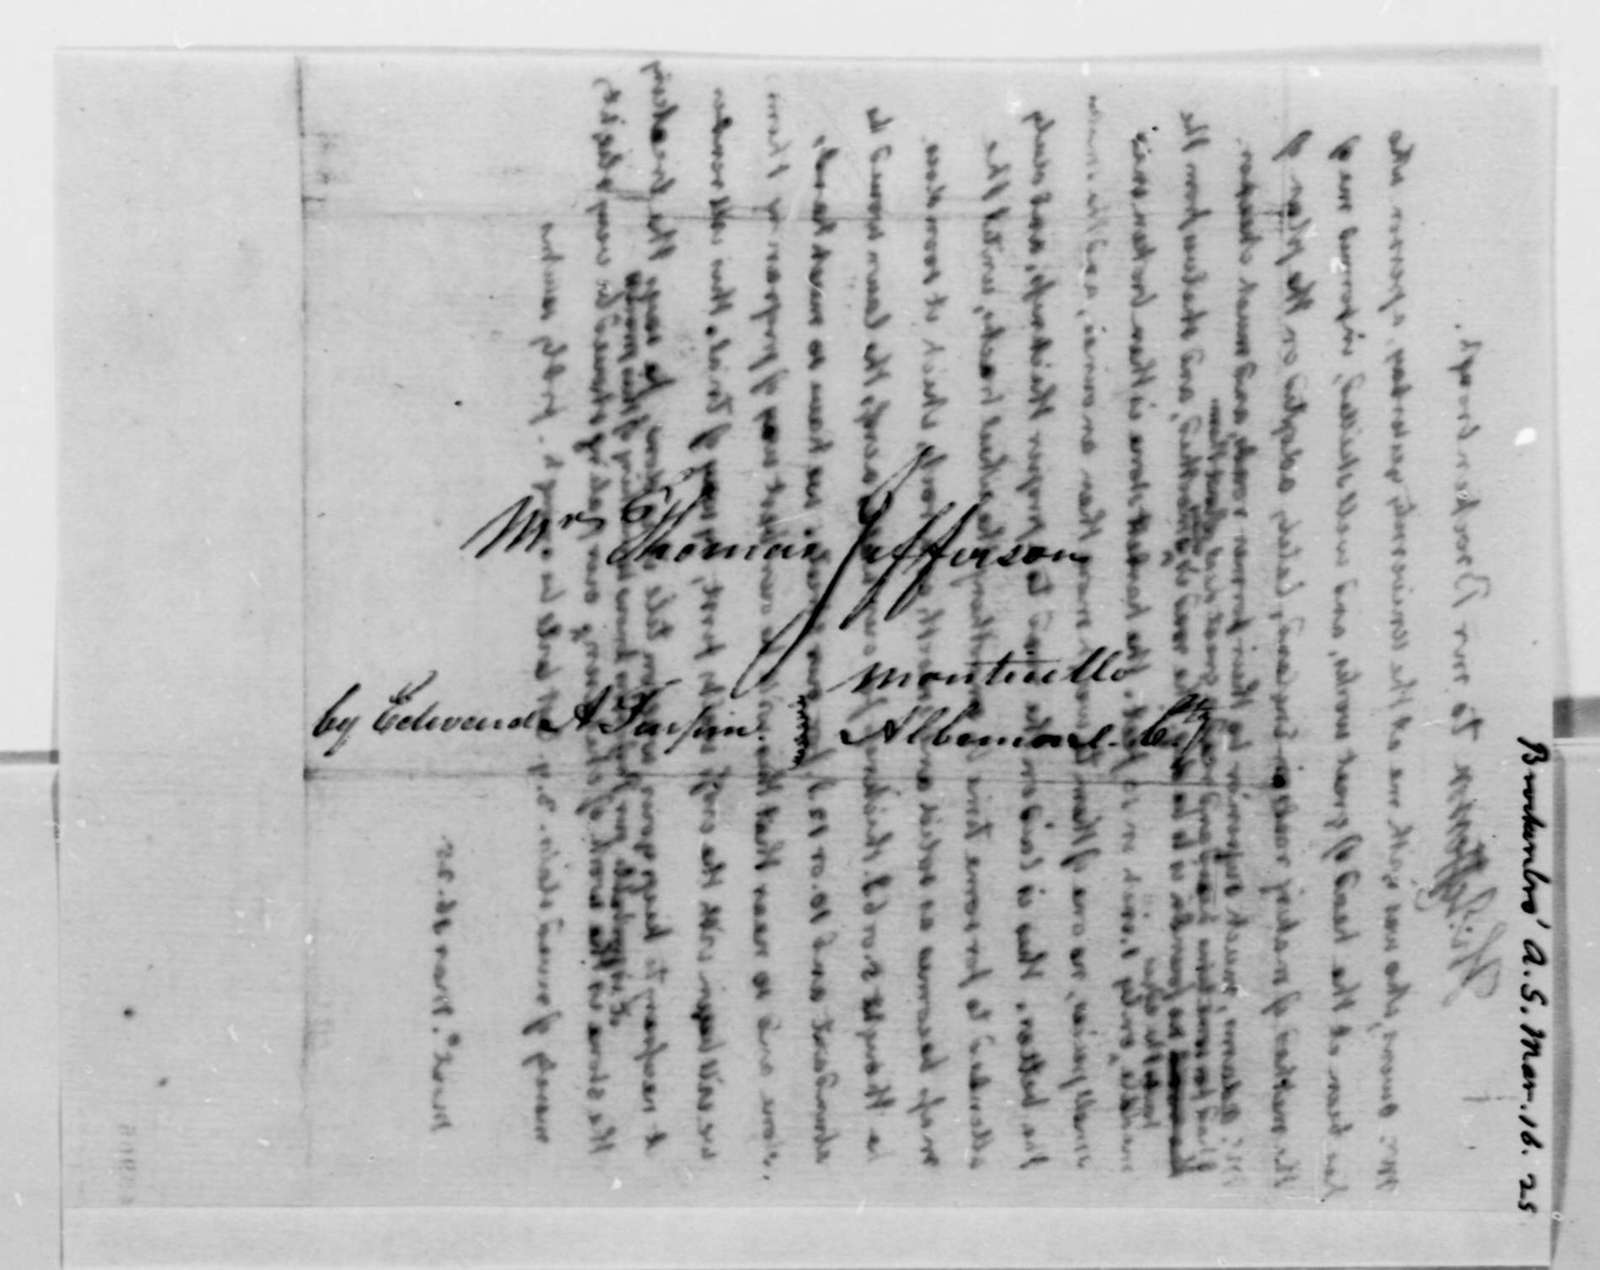 Thomas Jefferson to Arthur S. Brockenbrough, March 16, 1825